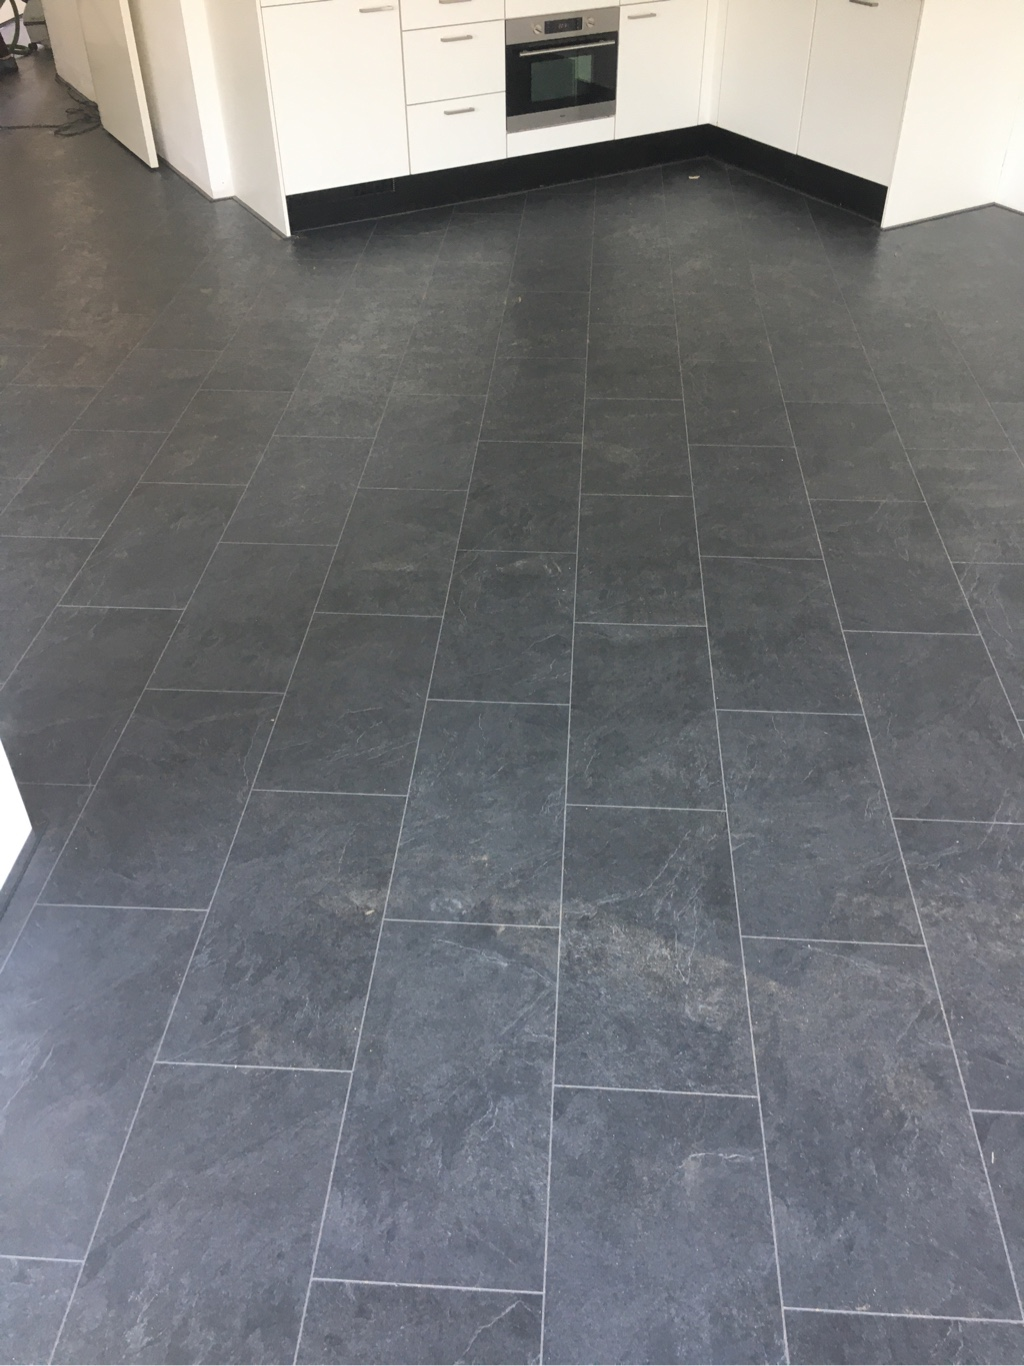 70 m² VH9510 Black Slate Tegel te Nieuwegein